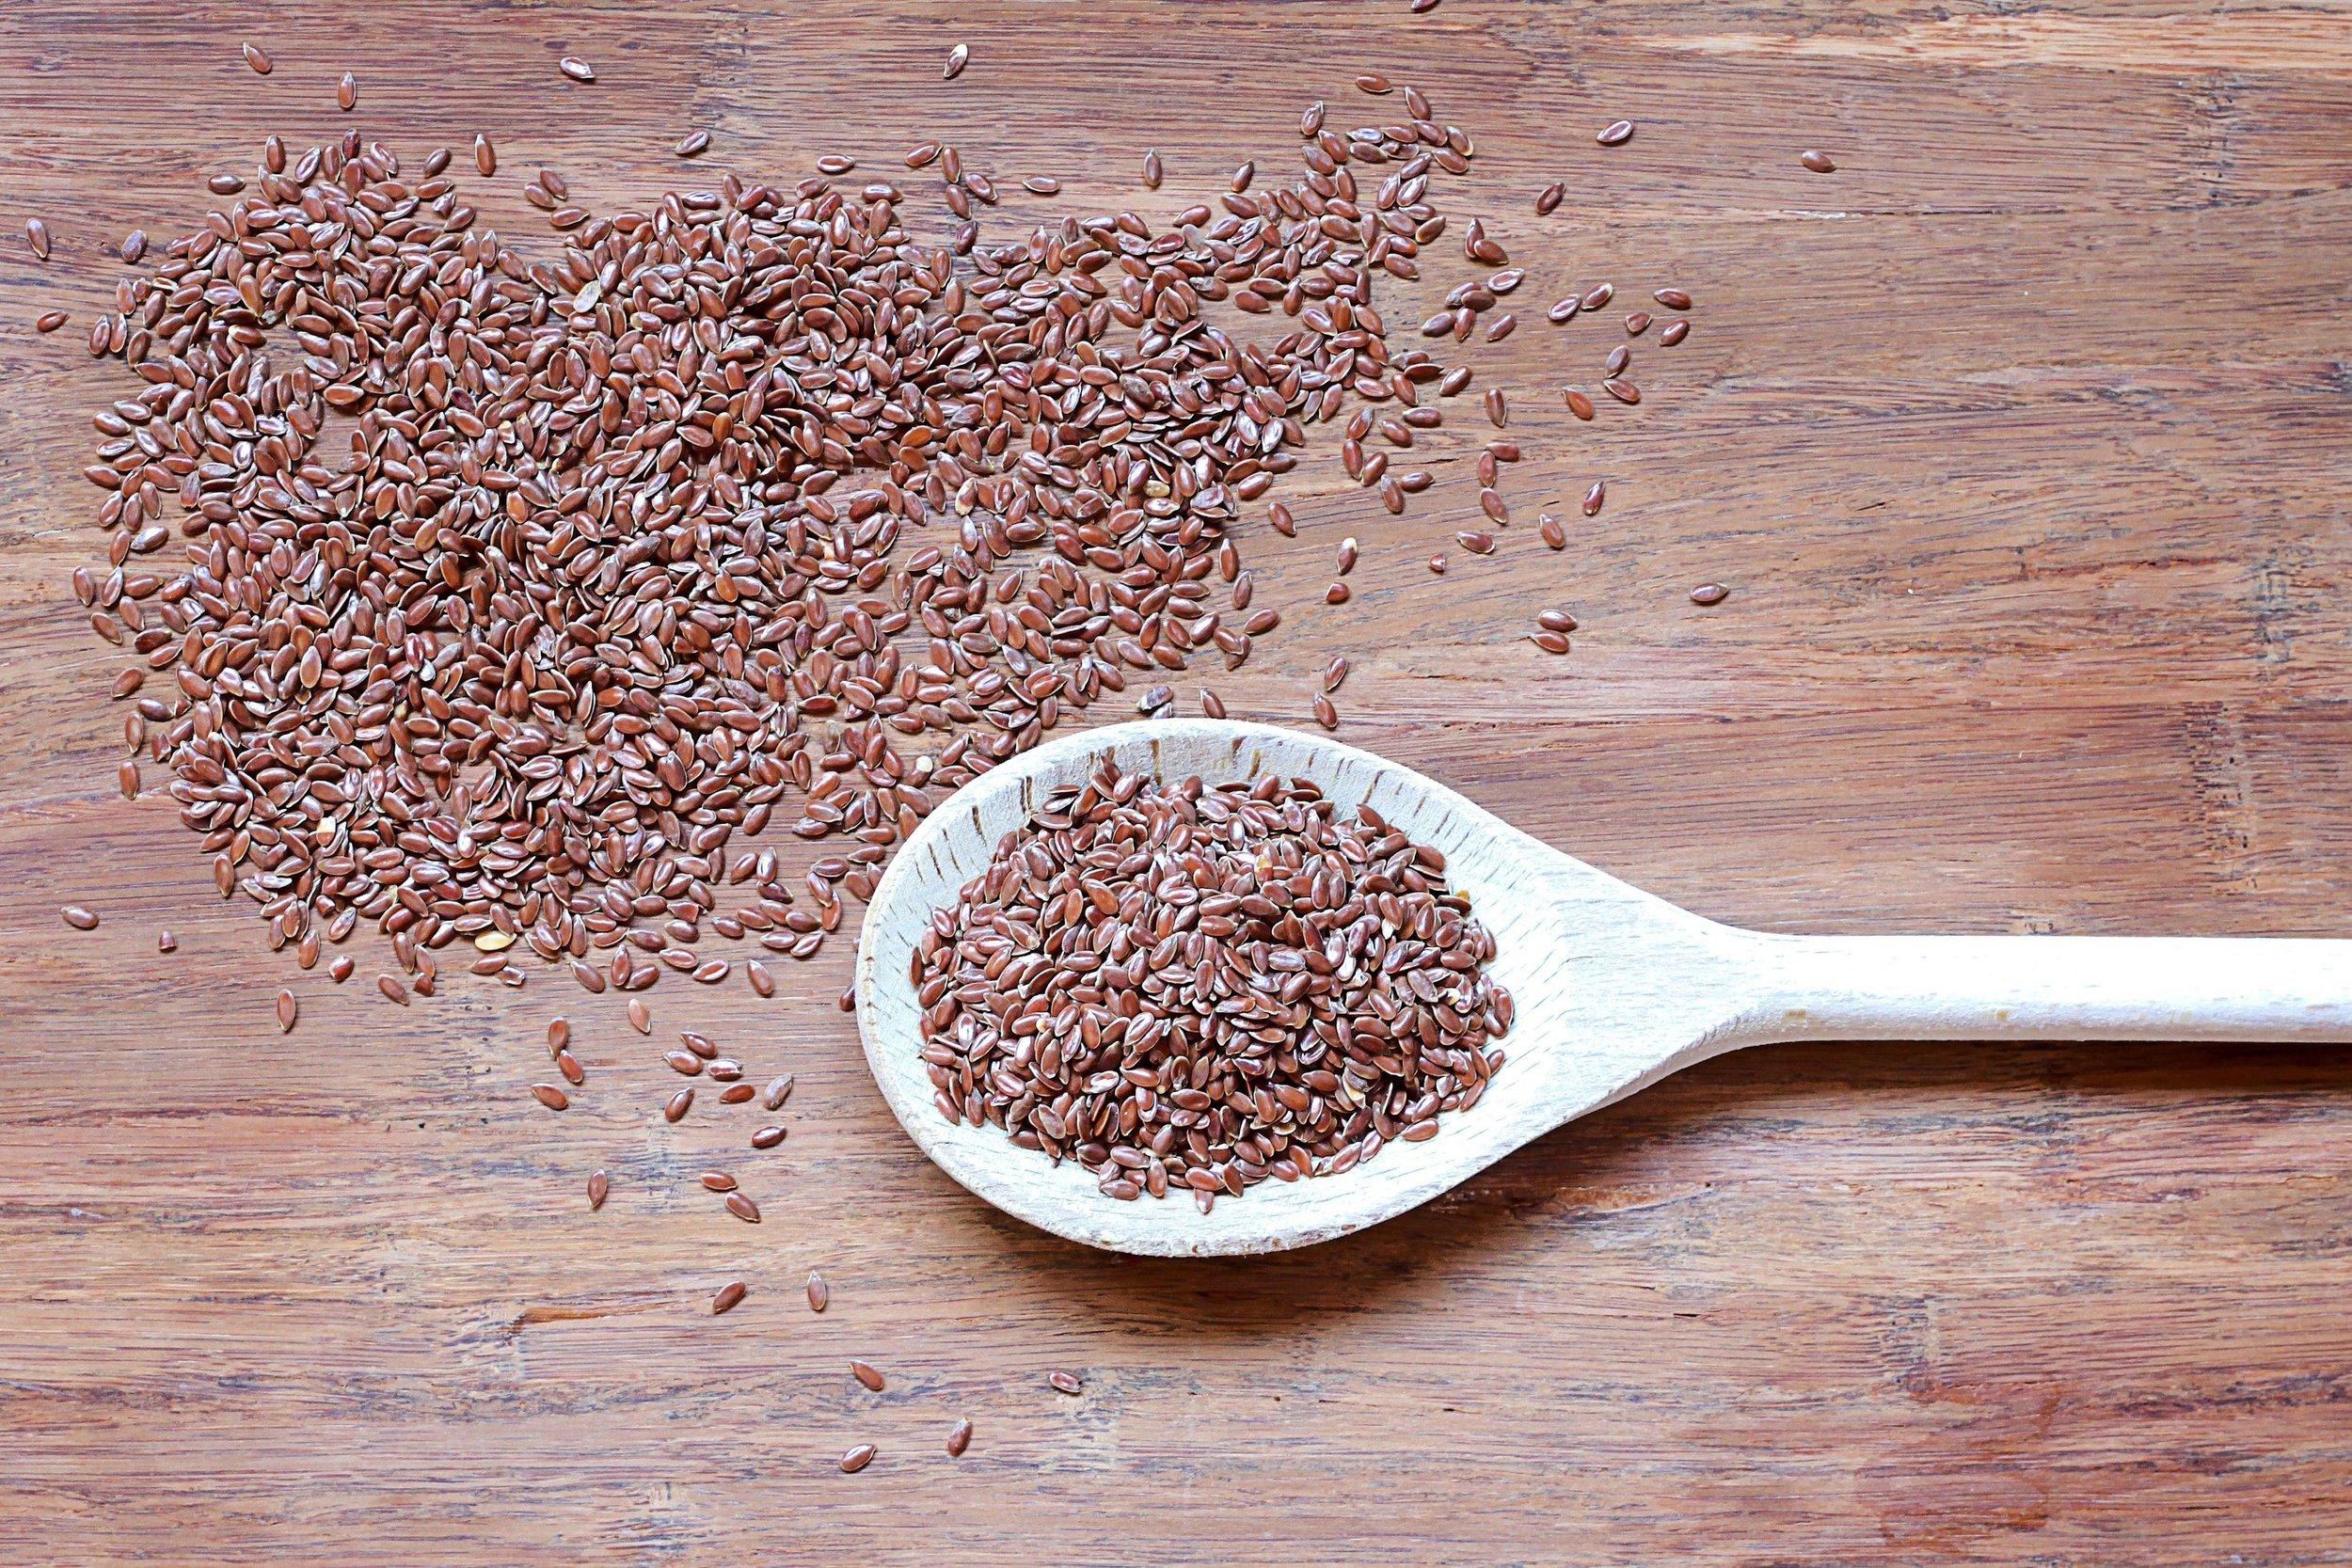 flax-seeds-in-wooden-spoon.jpg